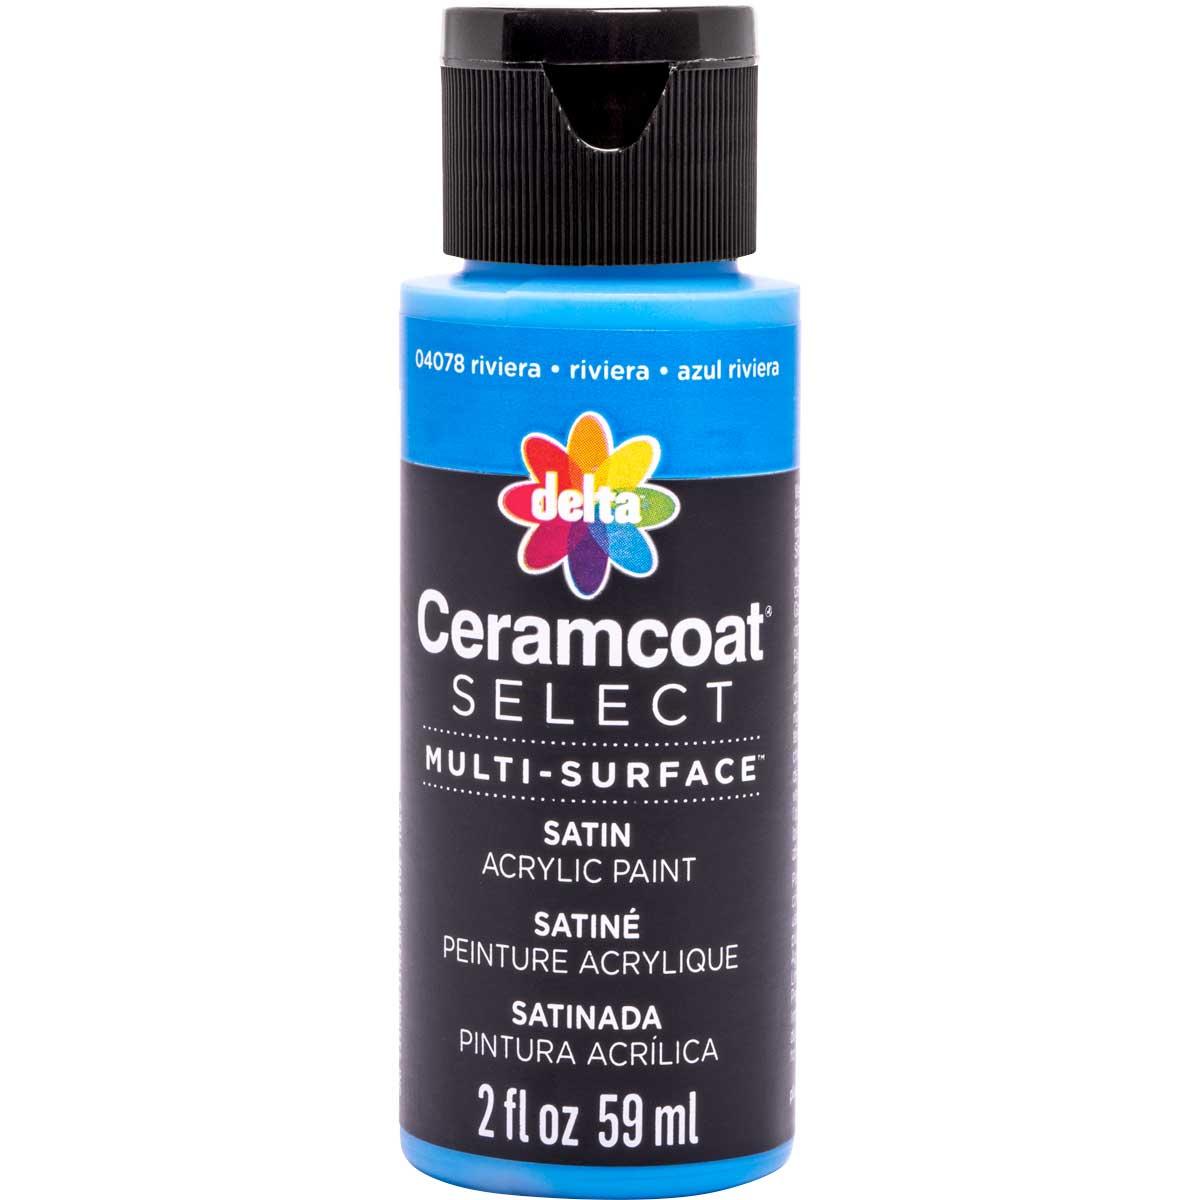 Delta Ceramcoat ® Select Multi-Surface Acrylic Paint - Satin - Riviera, 2 oz.